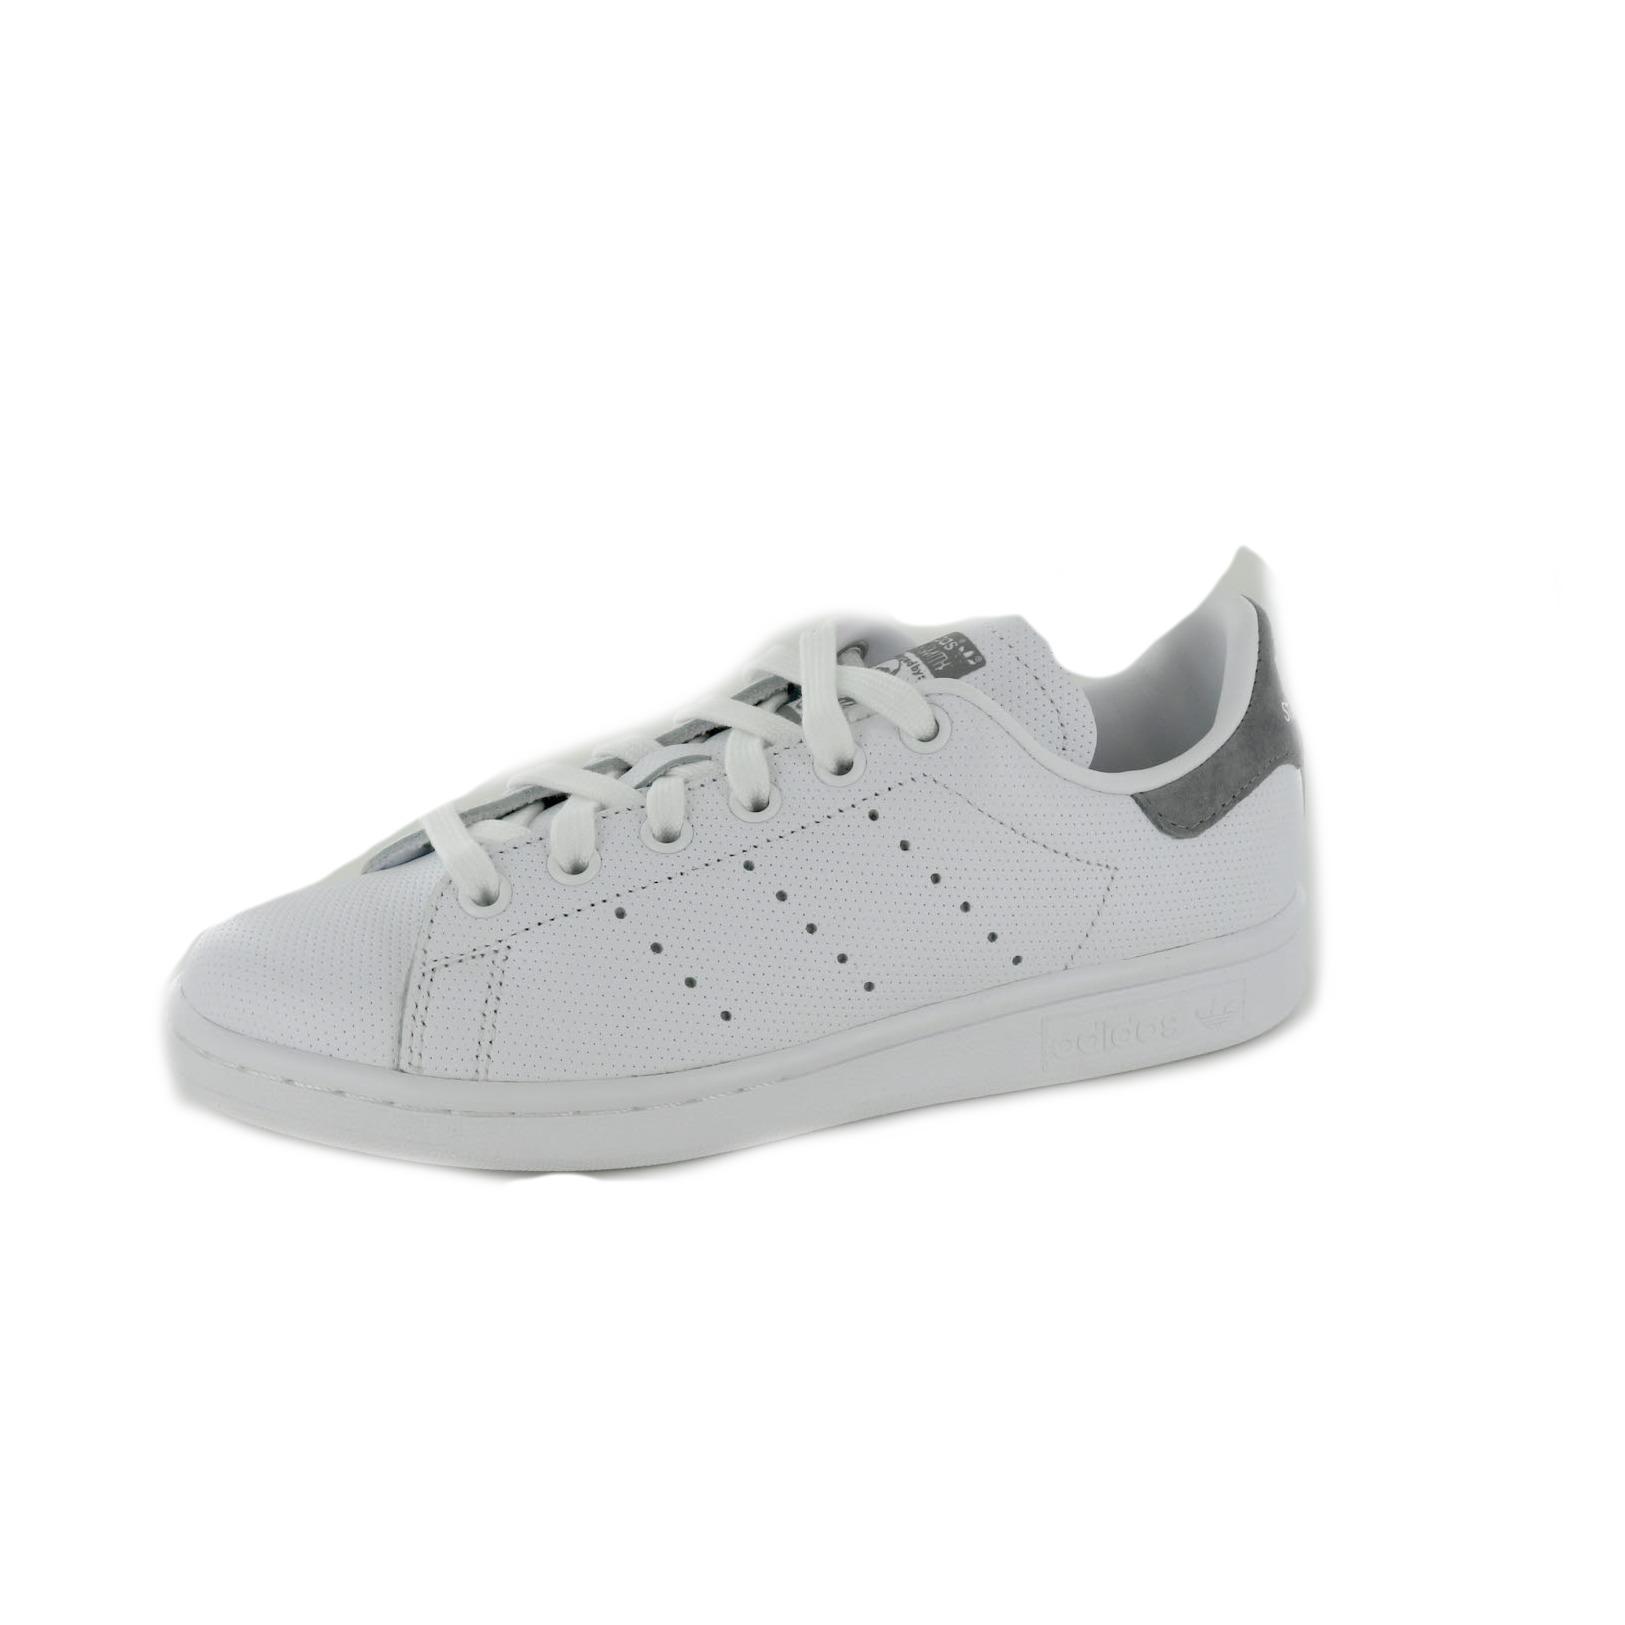 Adidas / Pizzo Scarpe - Scarpe Da Ginnastica, Bianco